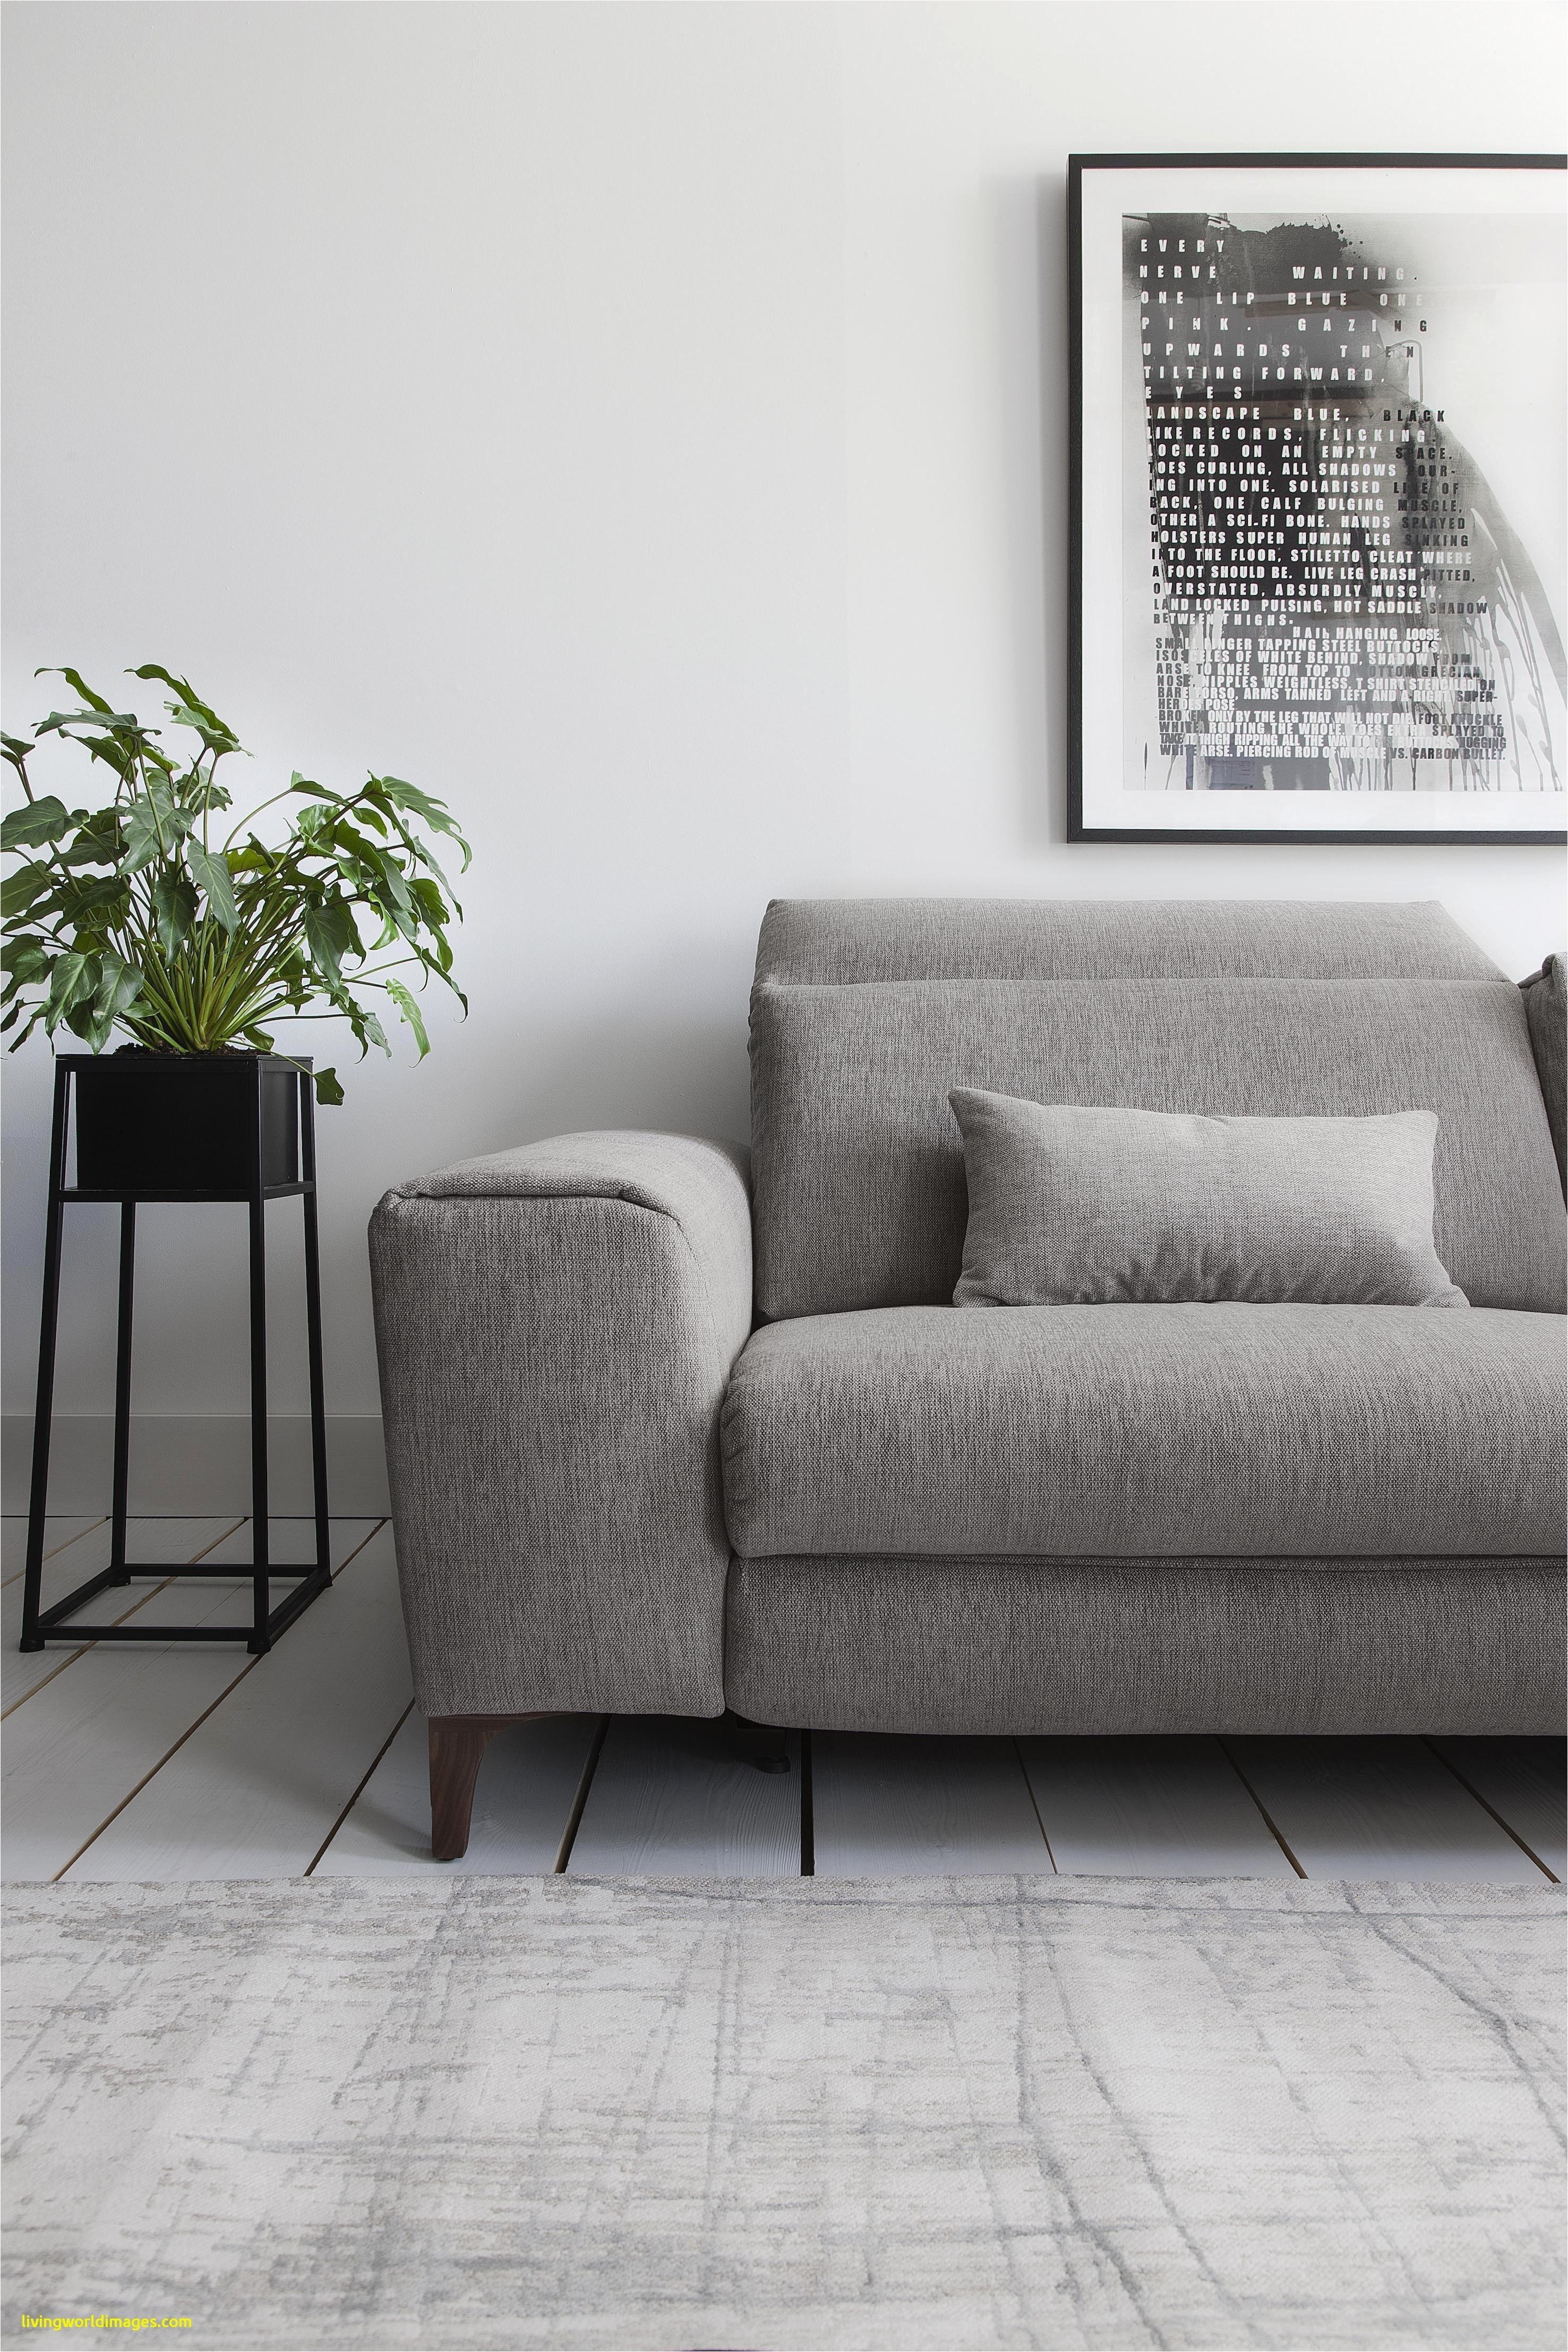 near me used furniture creative ideas 2nd hand living room furniture black sofa living room design new furniture black and